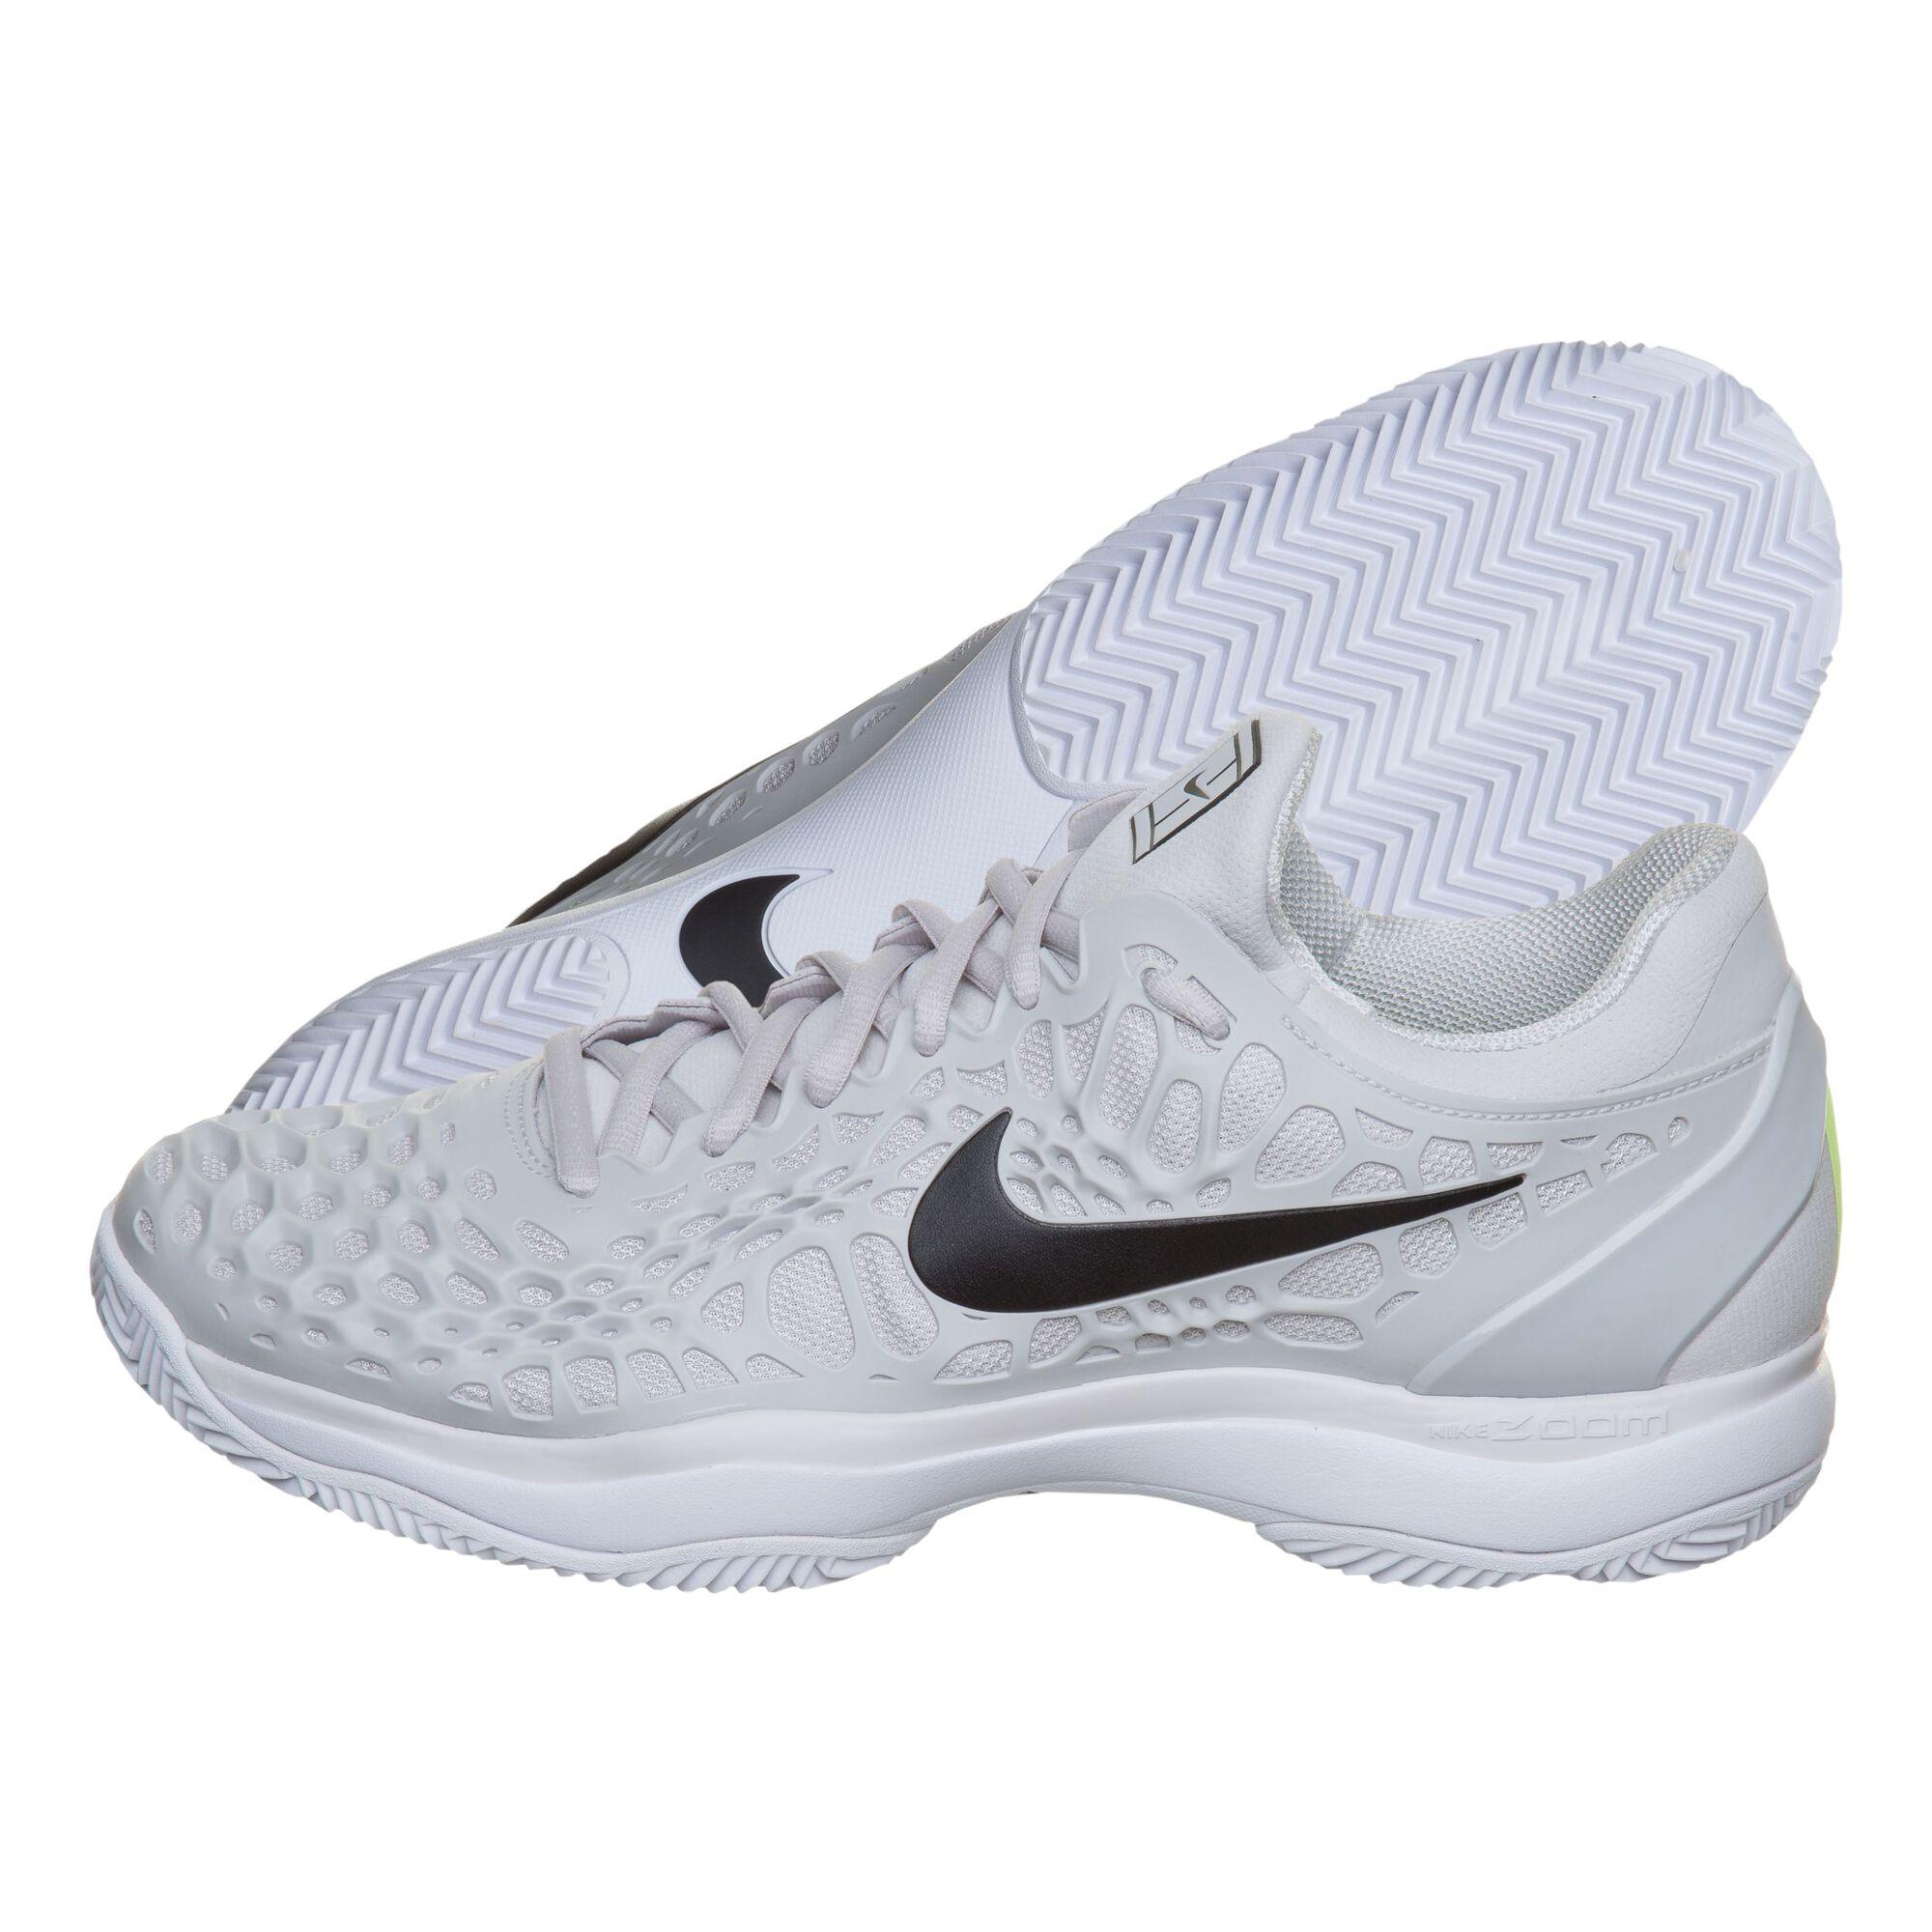 online retailer c2517 e6570 Nike Zoom Cage 3 Clay Sandplatzschuh Herren - Hellgrau, Schwarz ...